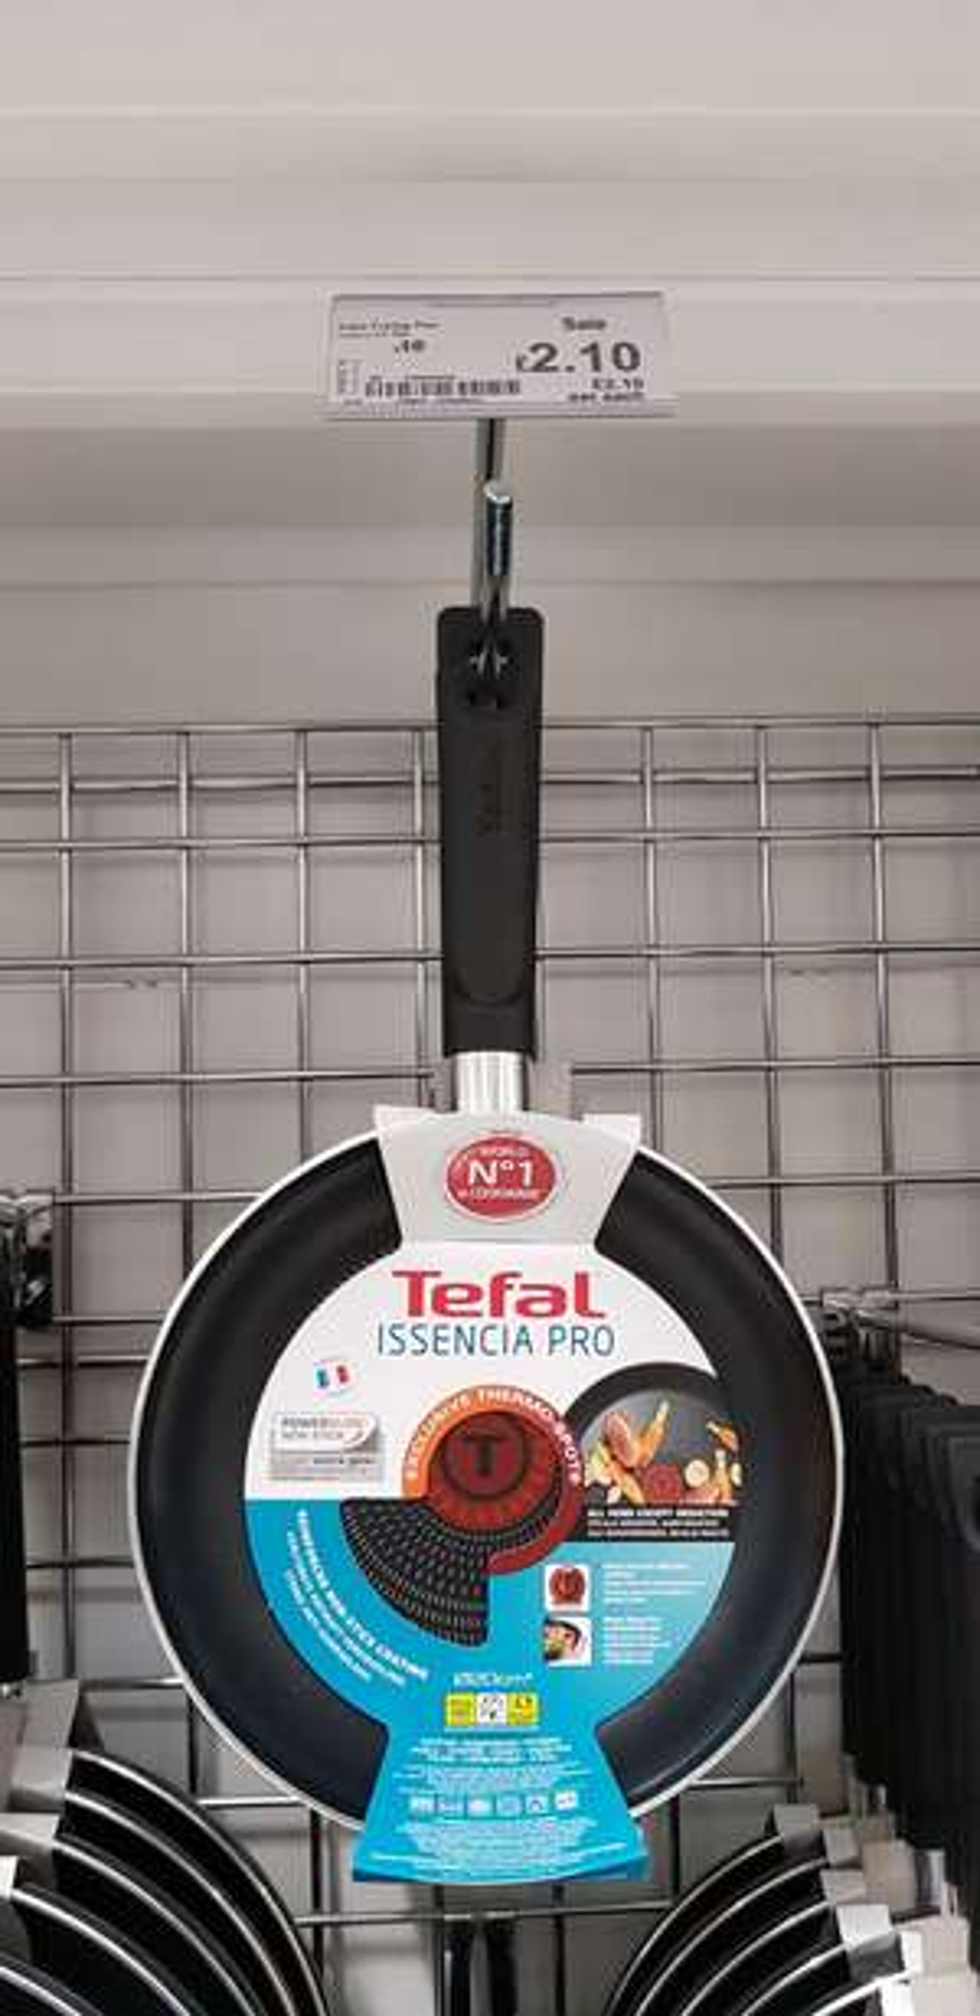 Tefal 20cm frying pan £2.10 @ Asda - Bournmouth